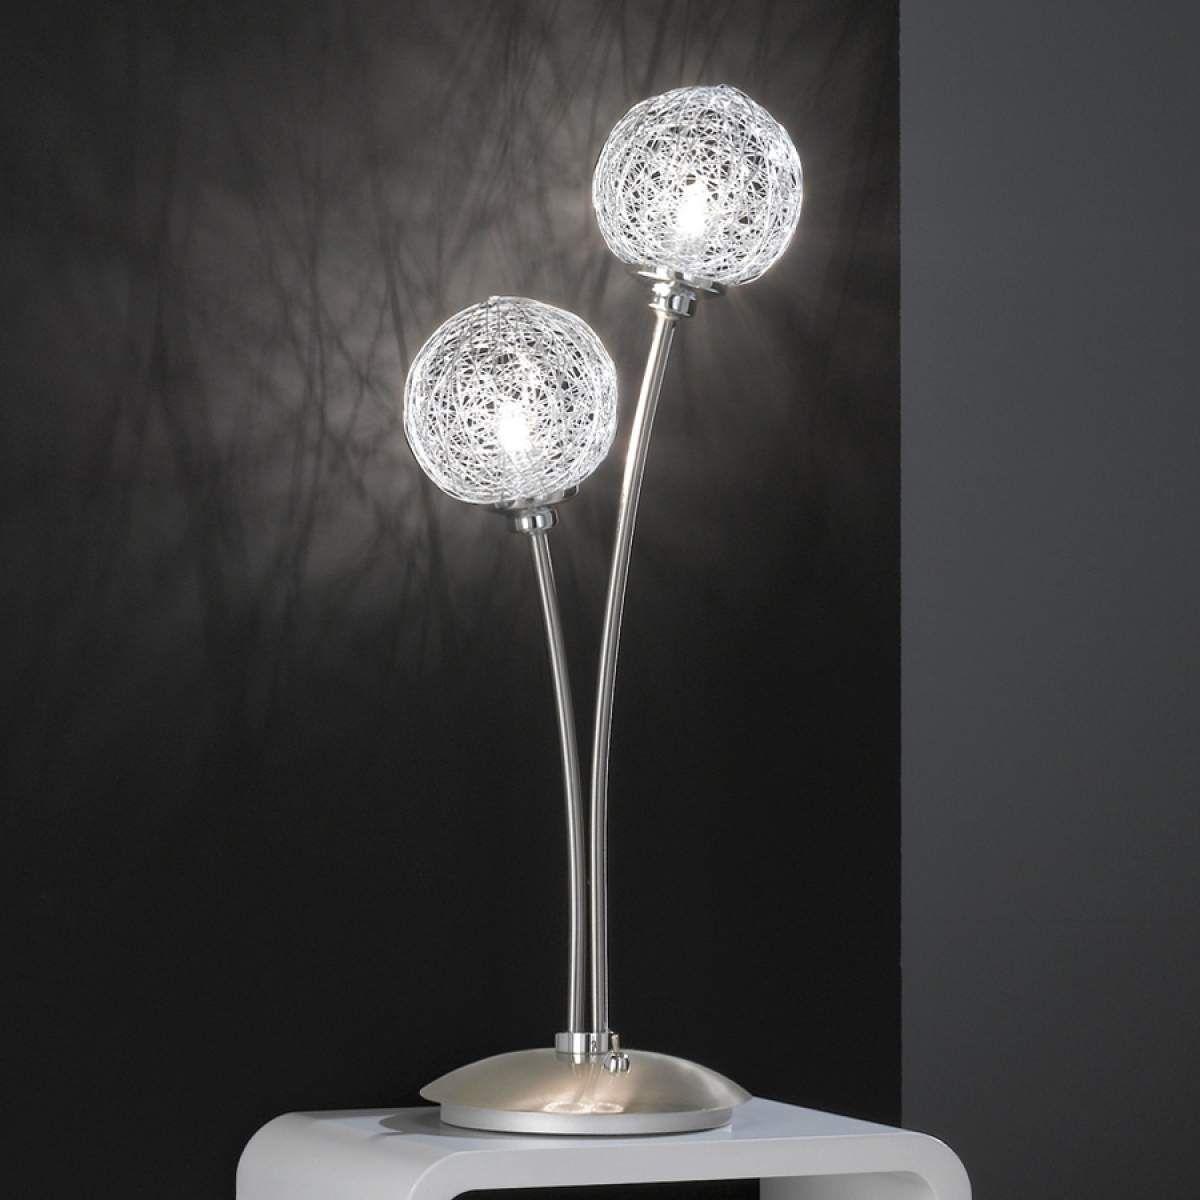 Lampe à poser moderne WOMBLELampe à poser   Paul Neuhaus